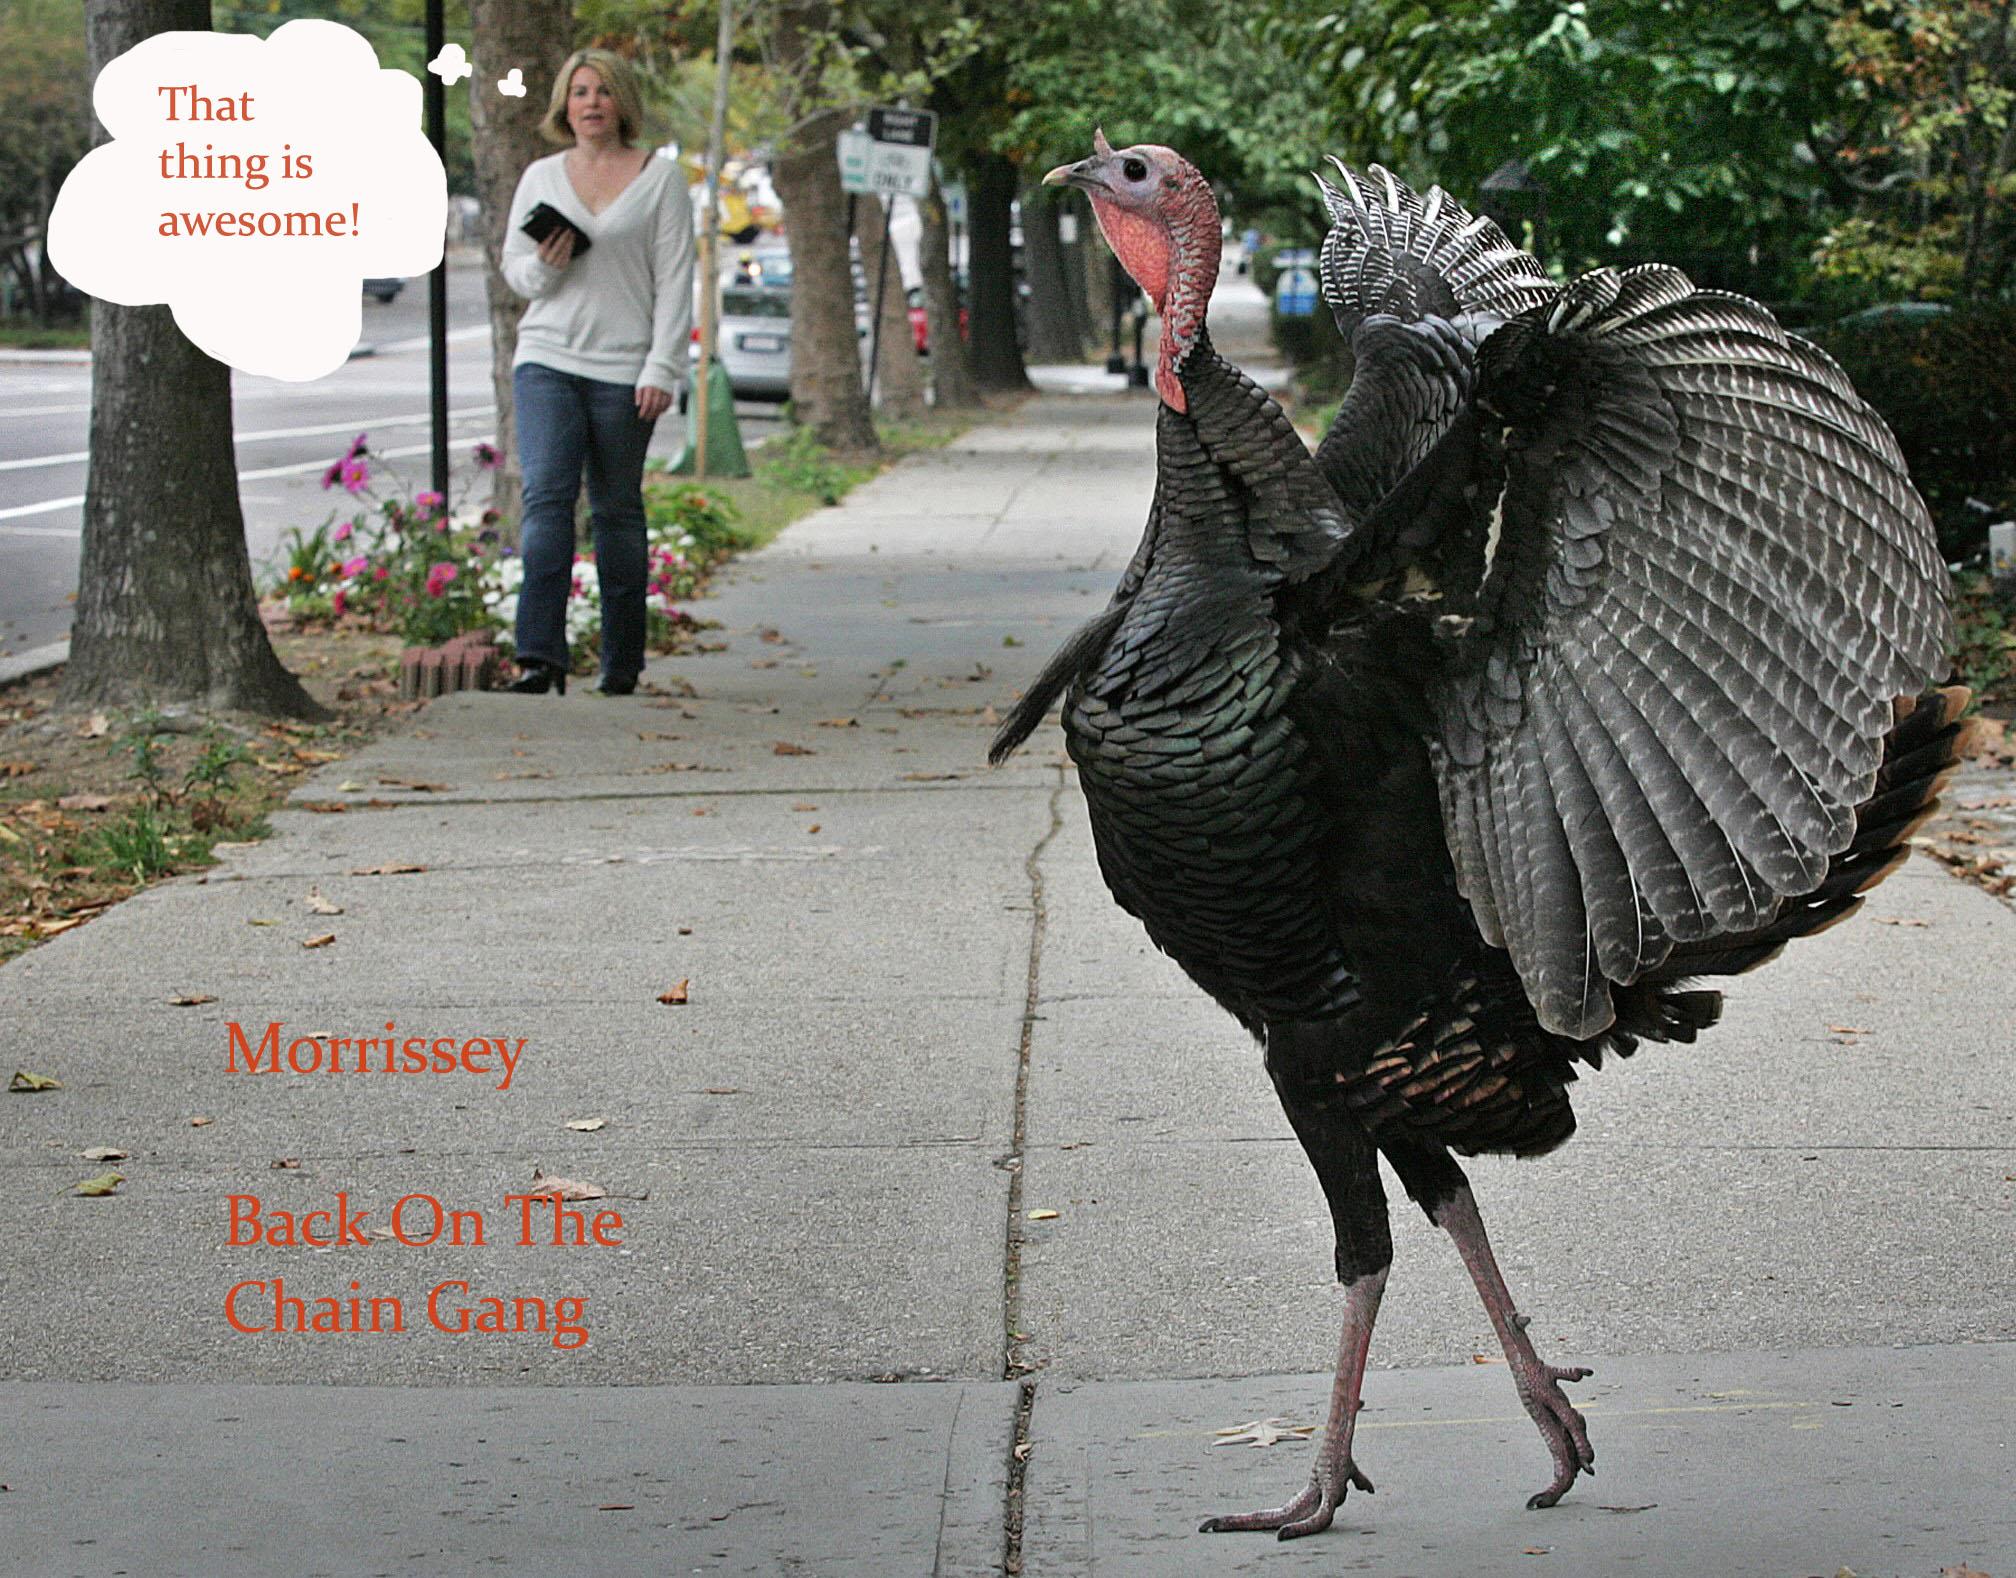 turkey-1 (Morrissey Back On The Chain Gang) copy.jpg